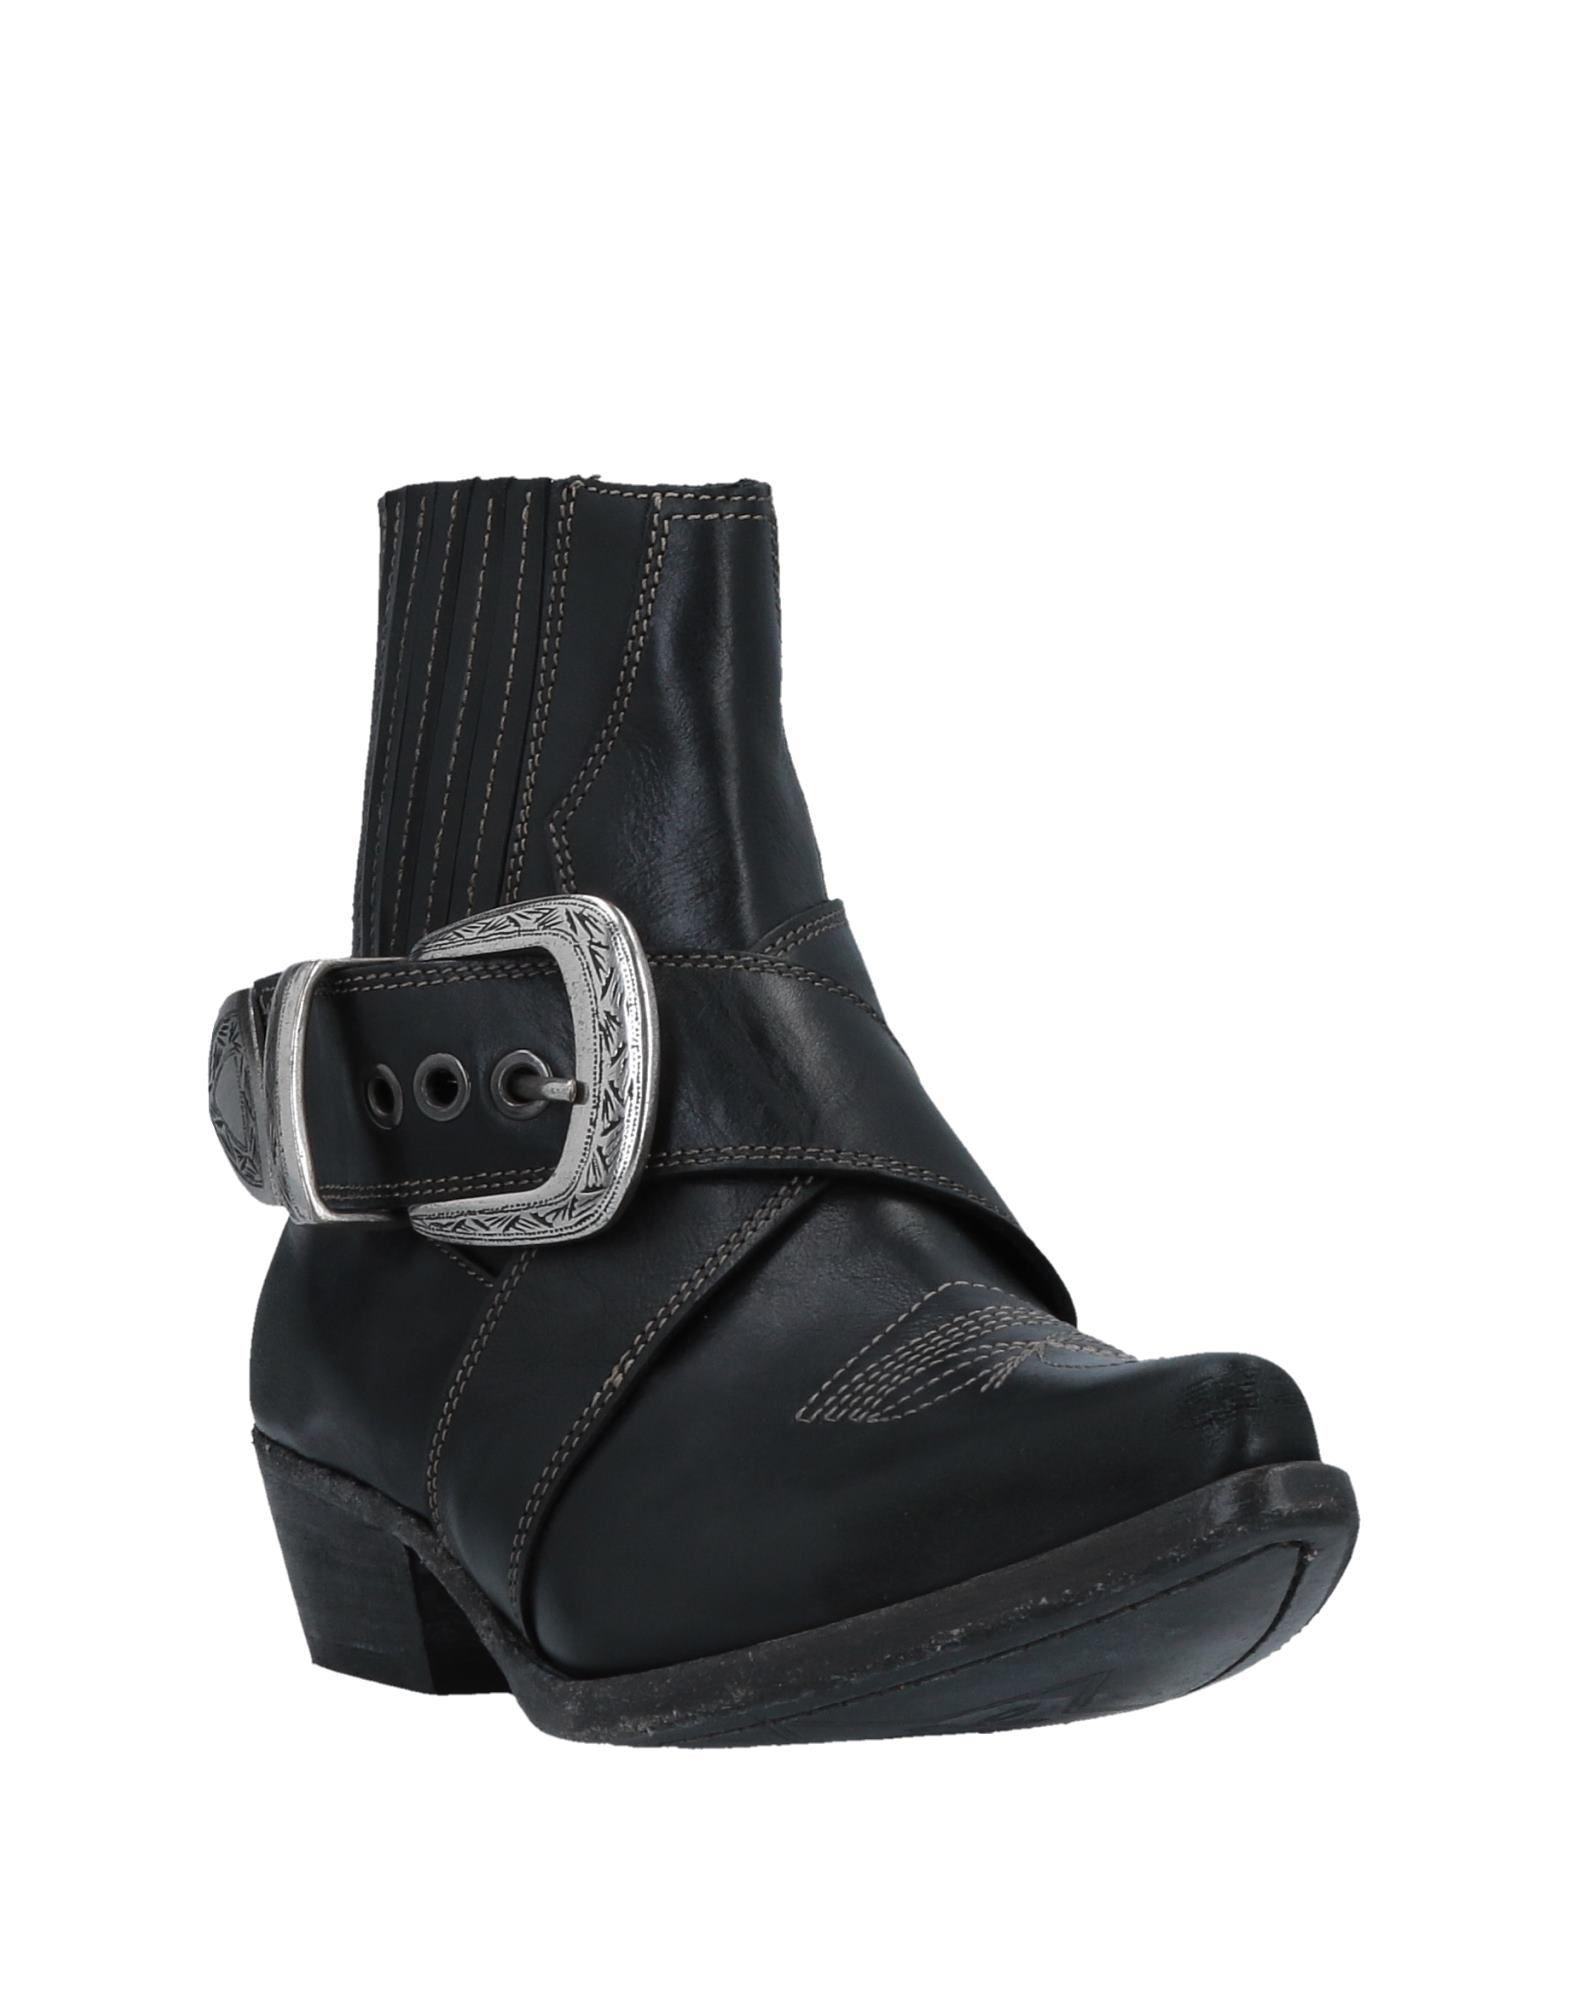 Materia Prima By Goffredo Fantini Stiefelette Damen  11509476UFGut aussehende strapazierfähige Schuhe